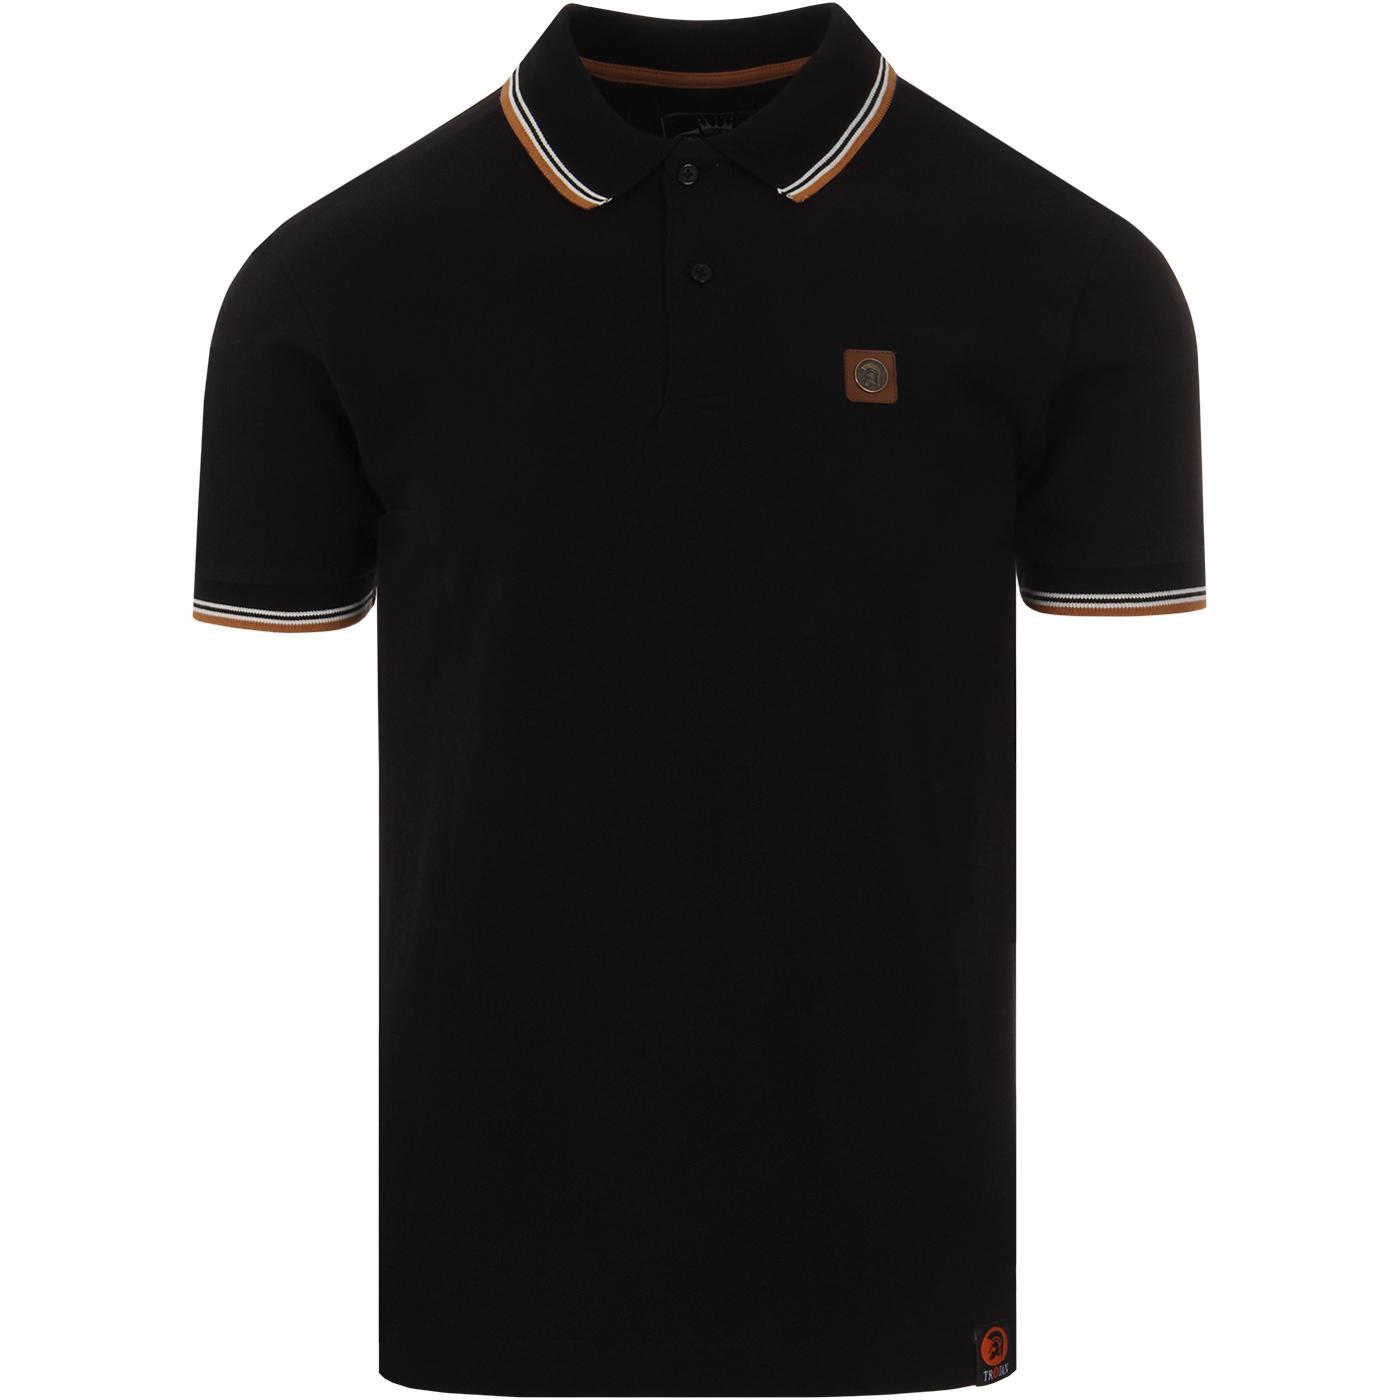 TROJAN RECORDS Classic Tipped Mod Polo Shirt BLACK